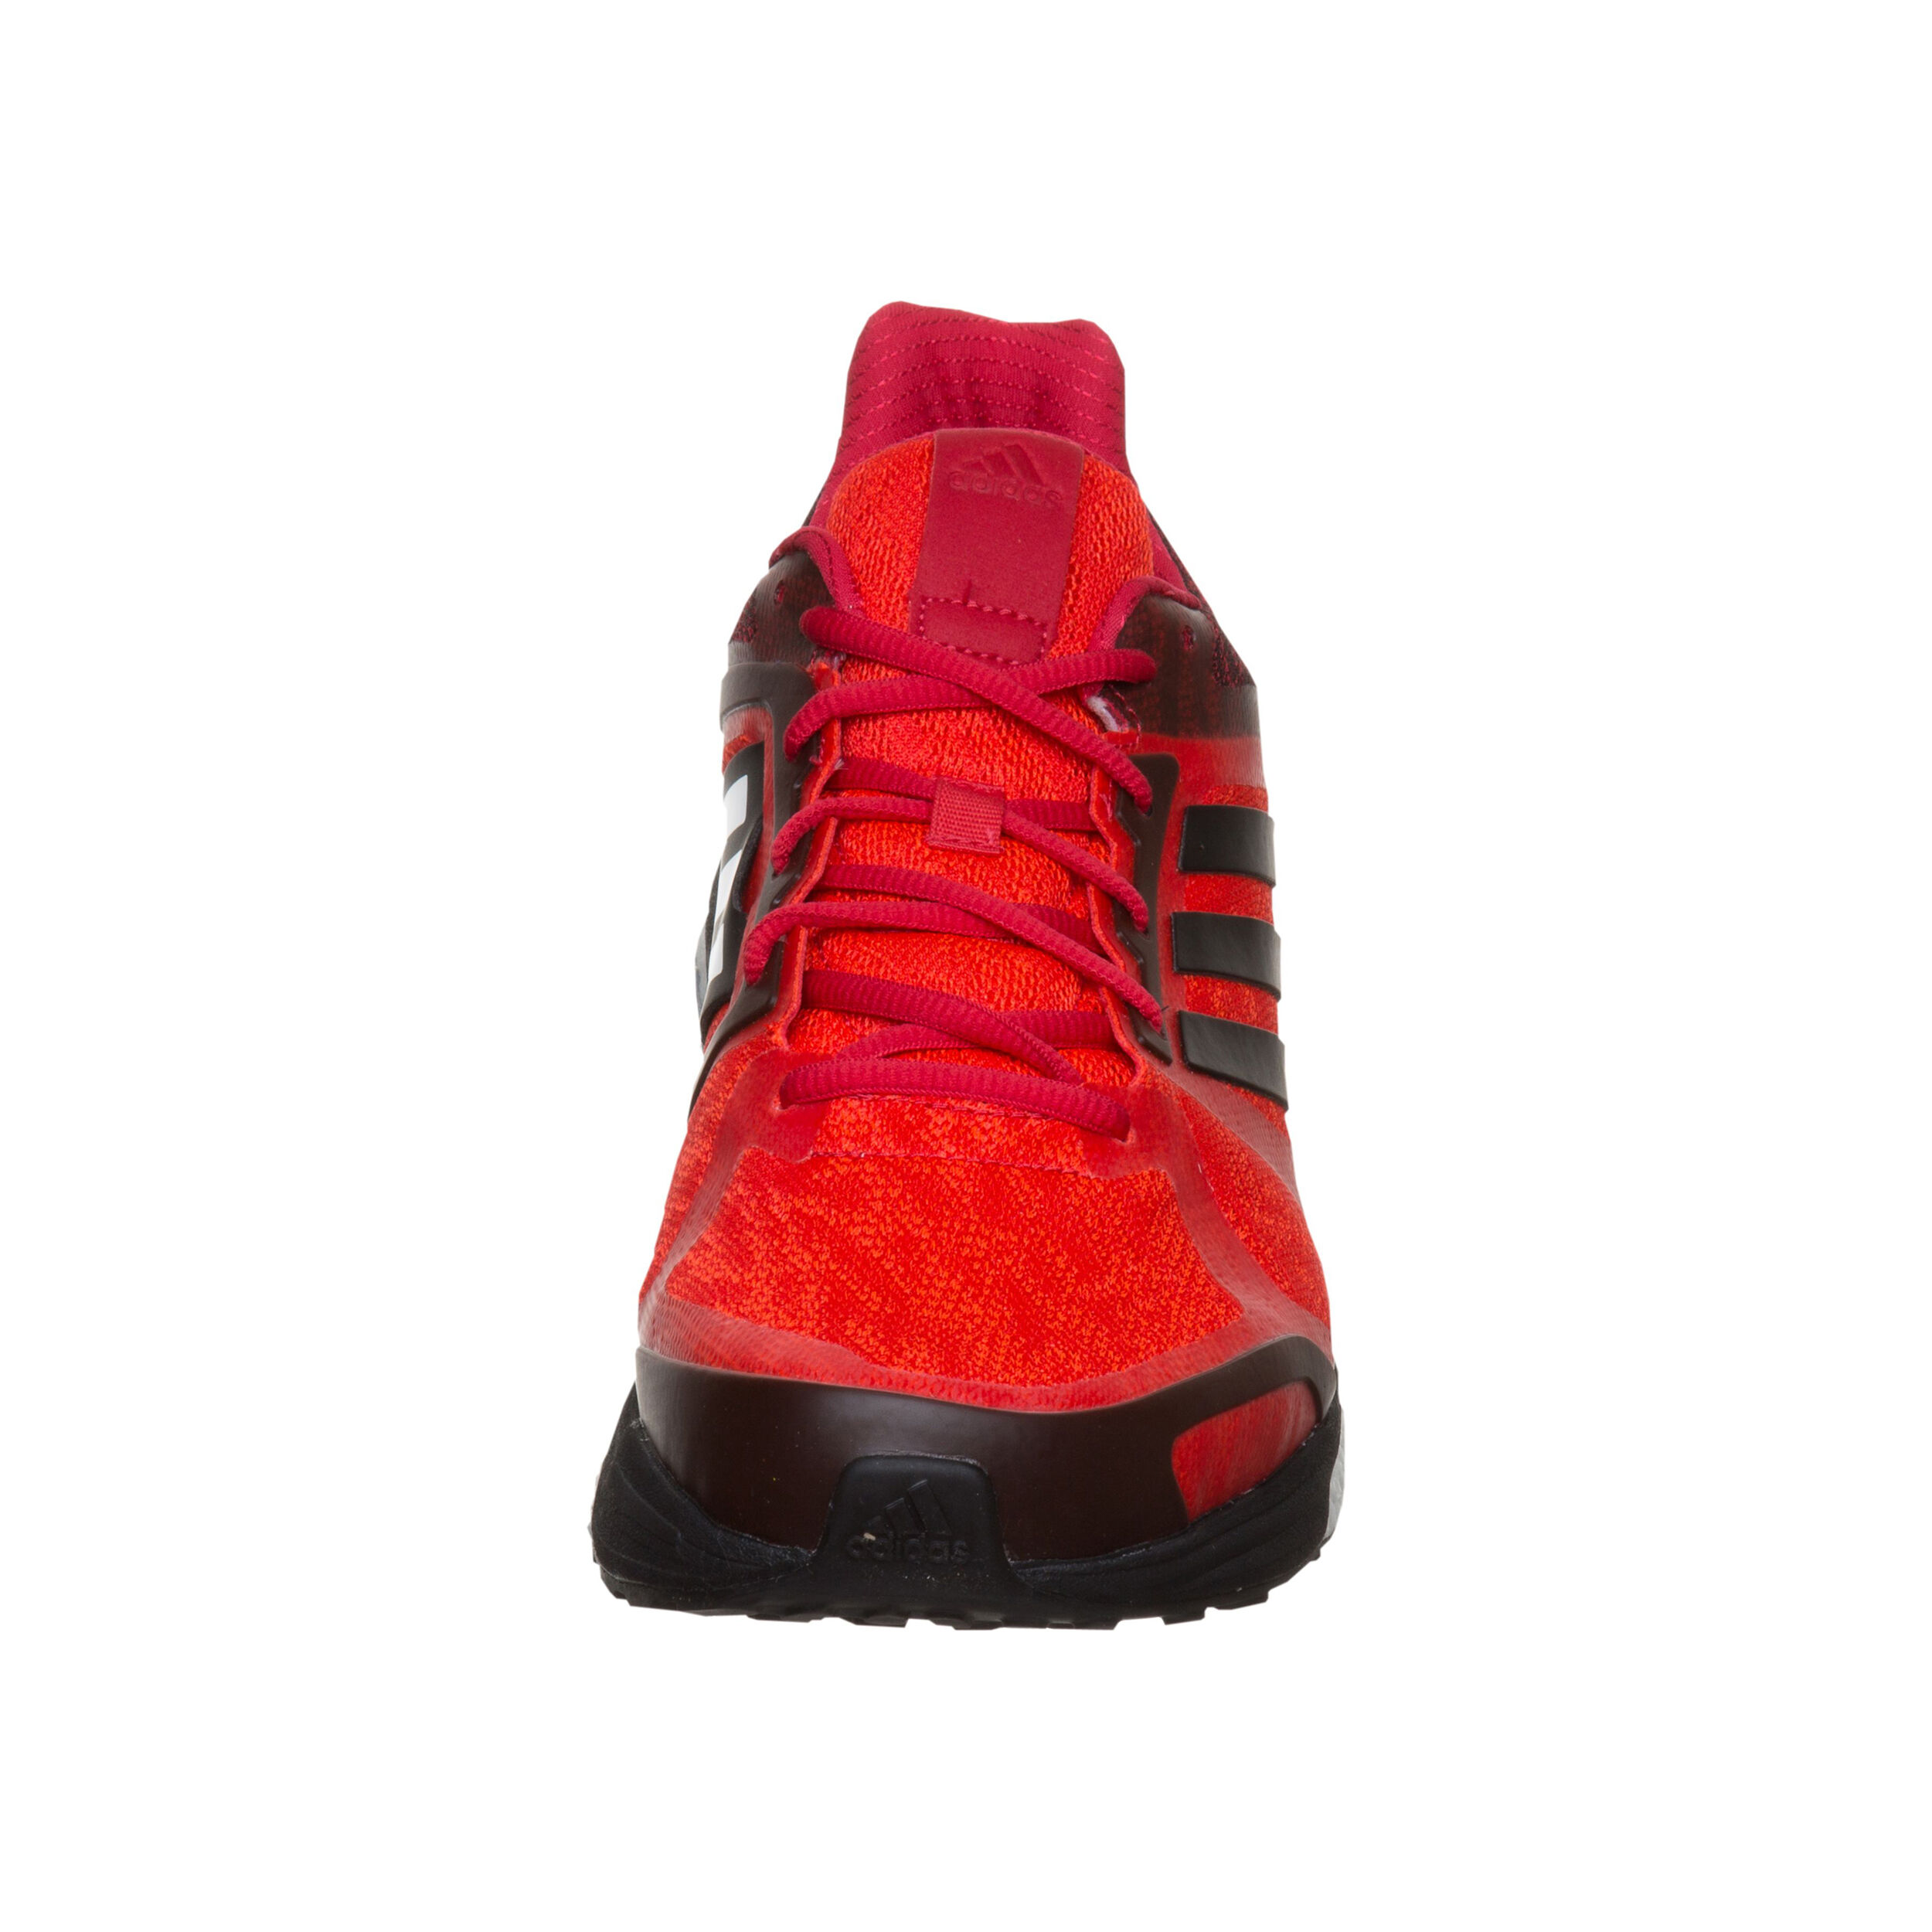 adidas Supernova Sequence 9 Stabilitätsschuh Herren Rot